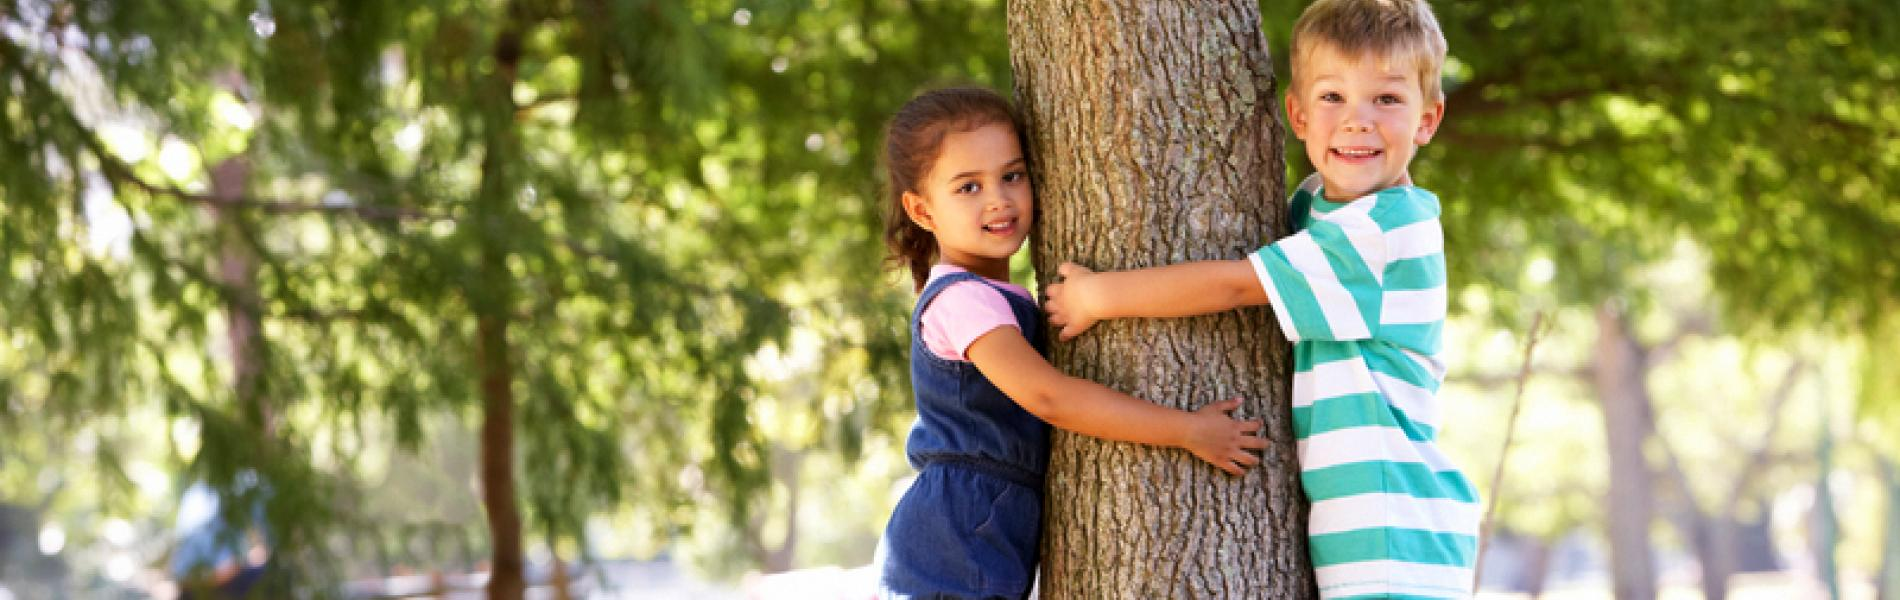 Backyard Saturday - Hug a Tree Day